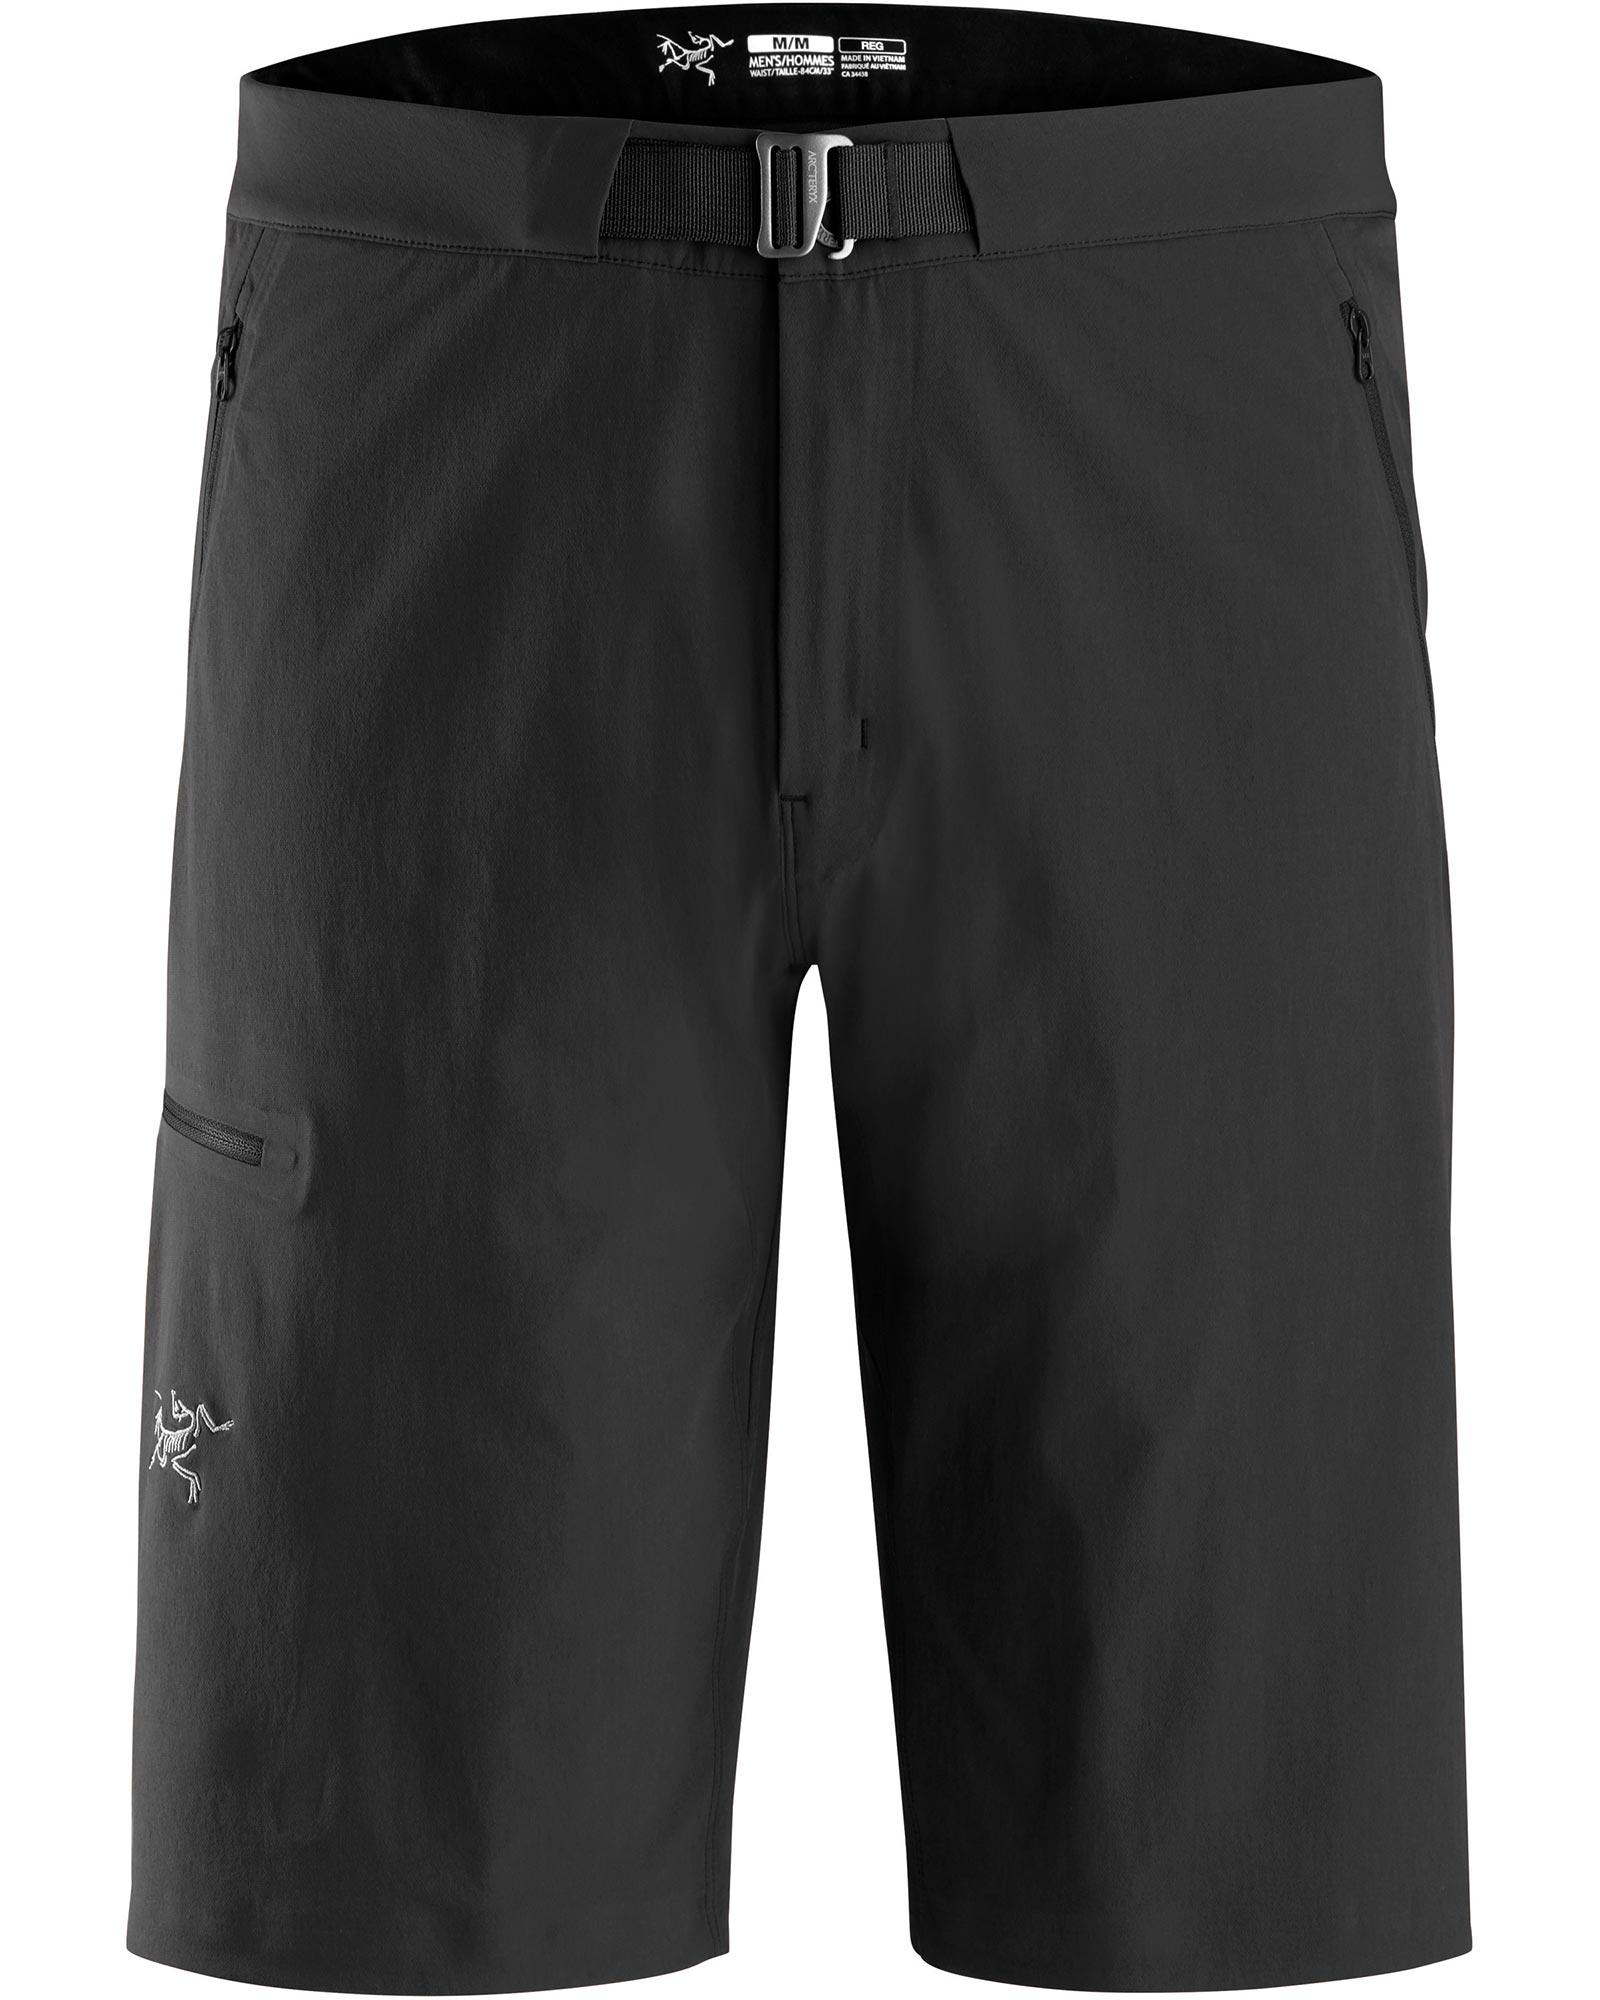 Arc'teryx Men's Gamma LT Shorts 0